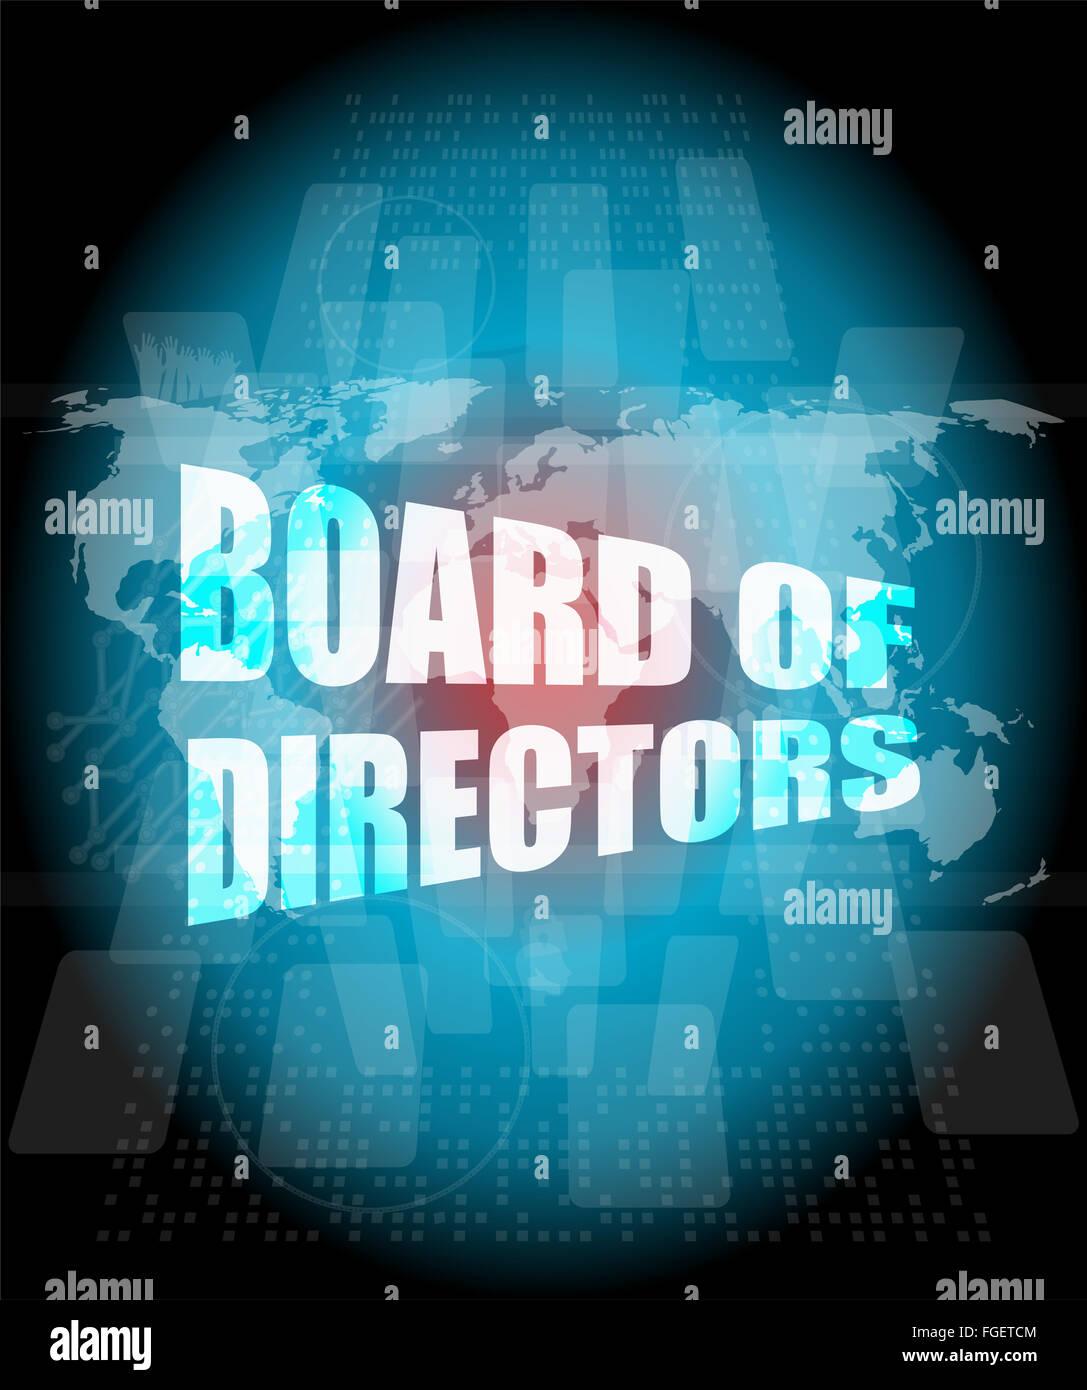 Board of directors words on digital screen background with world board of directors words on digital screen background with world map gumiabroncs Choice Image